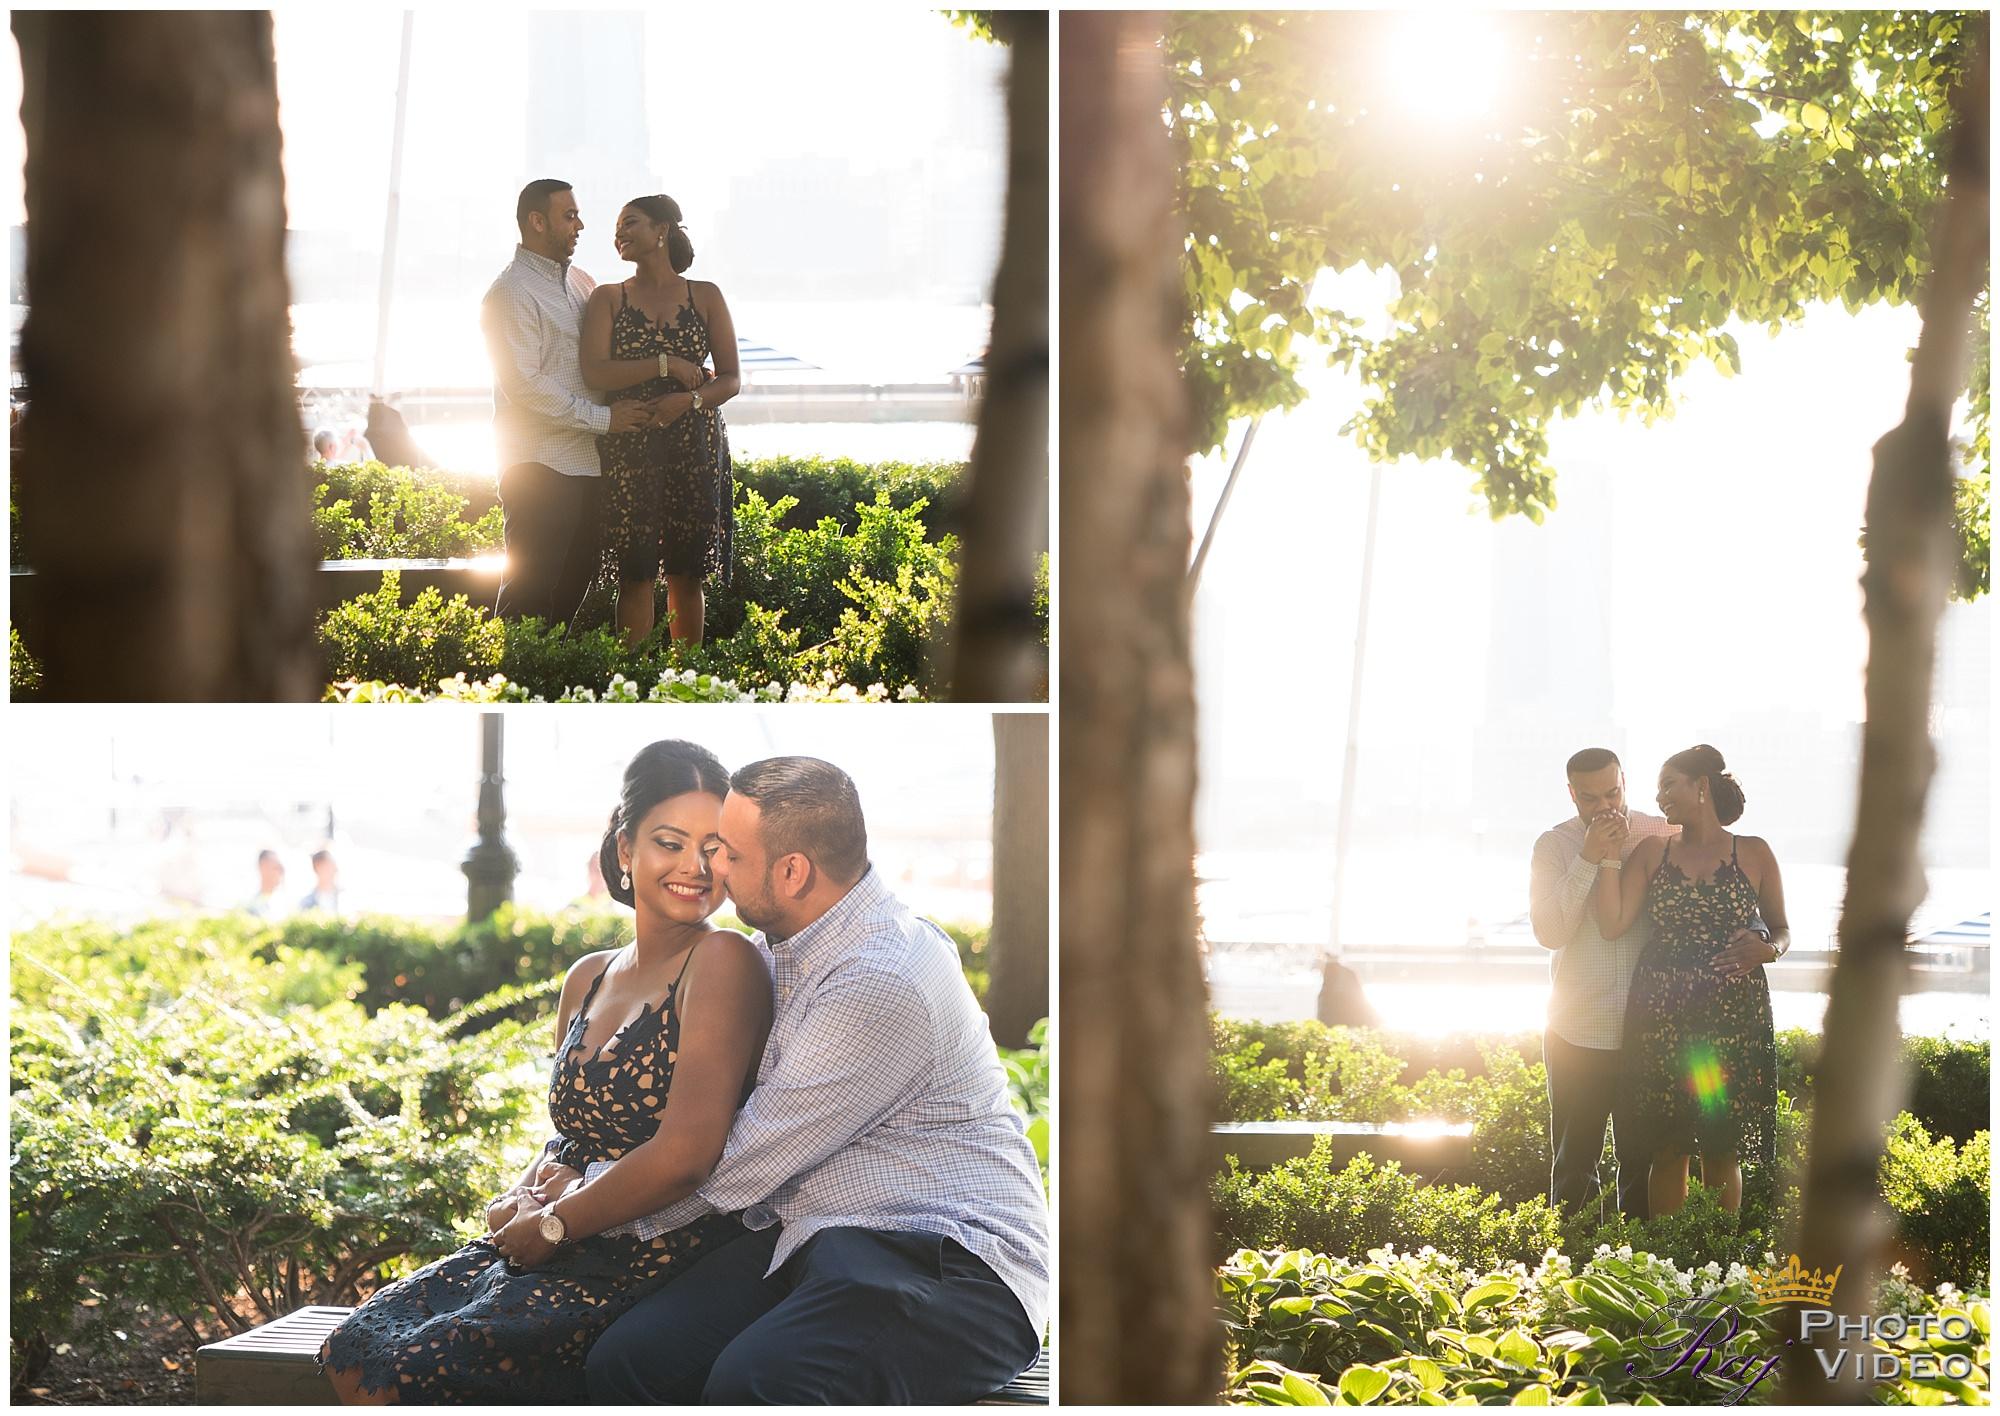 Brookfield-Place-New-York-Engagement-Shoot-Diana-Shaun-3.jpg